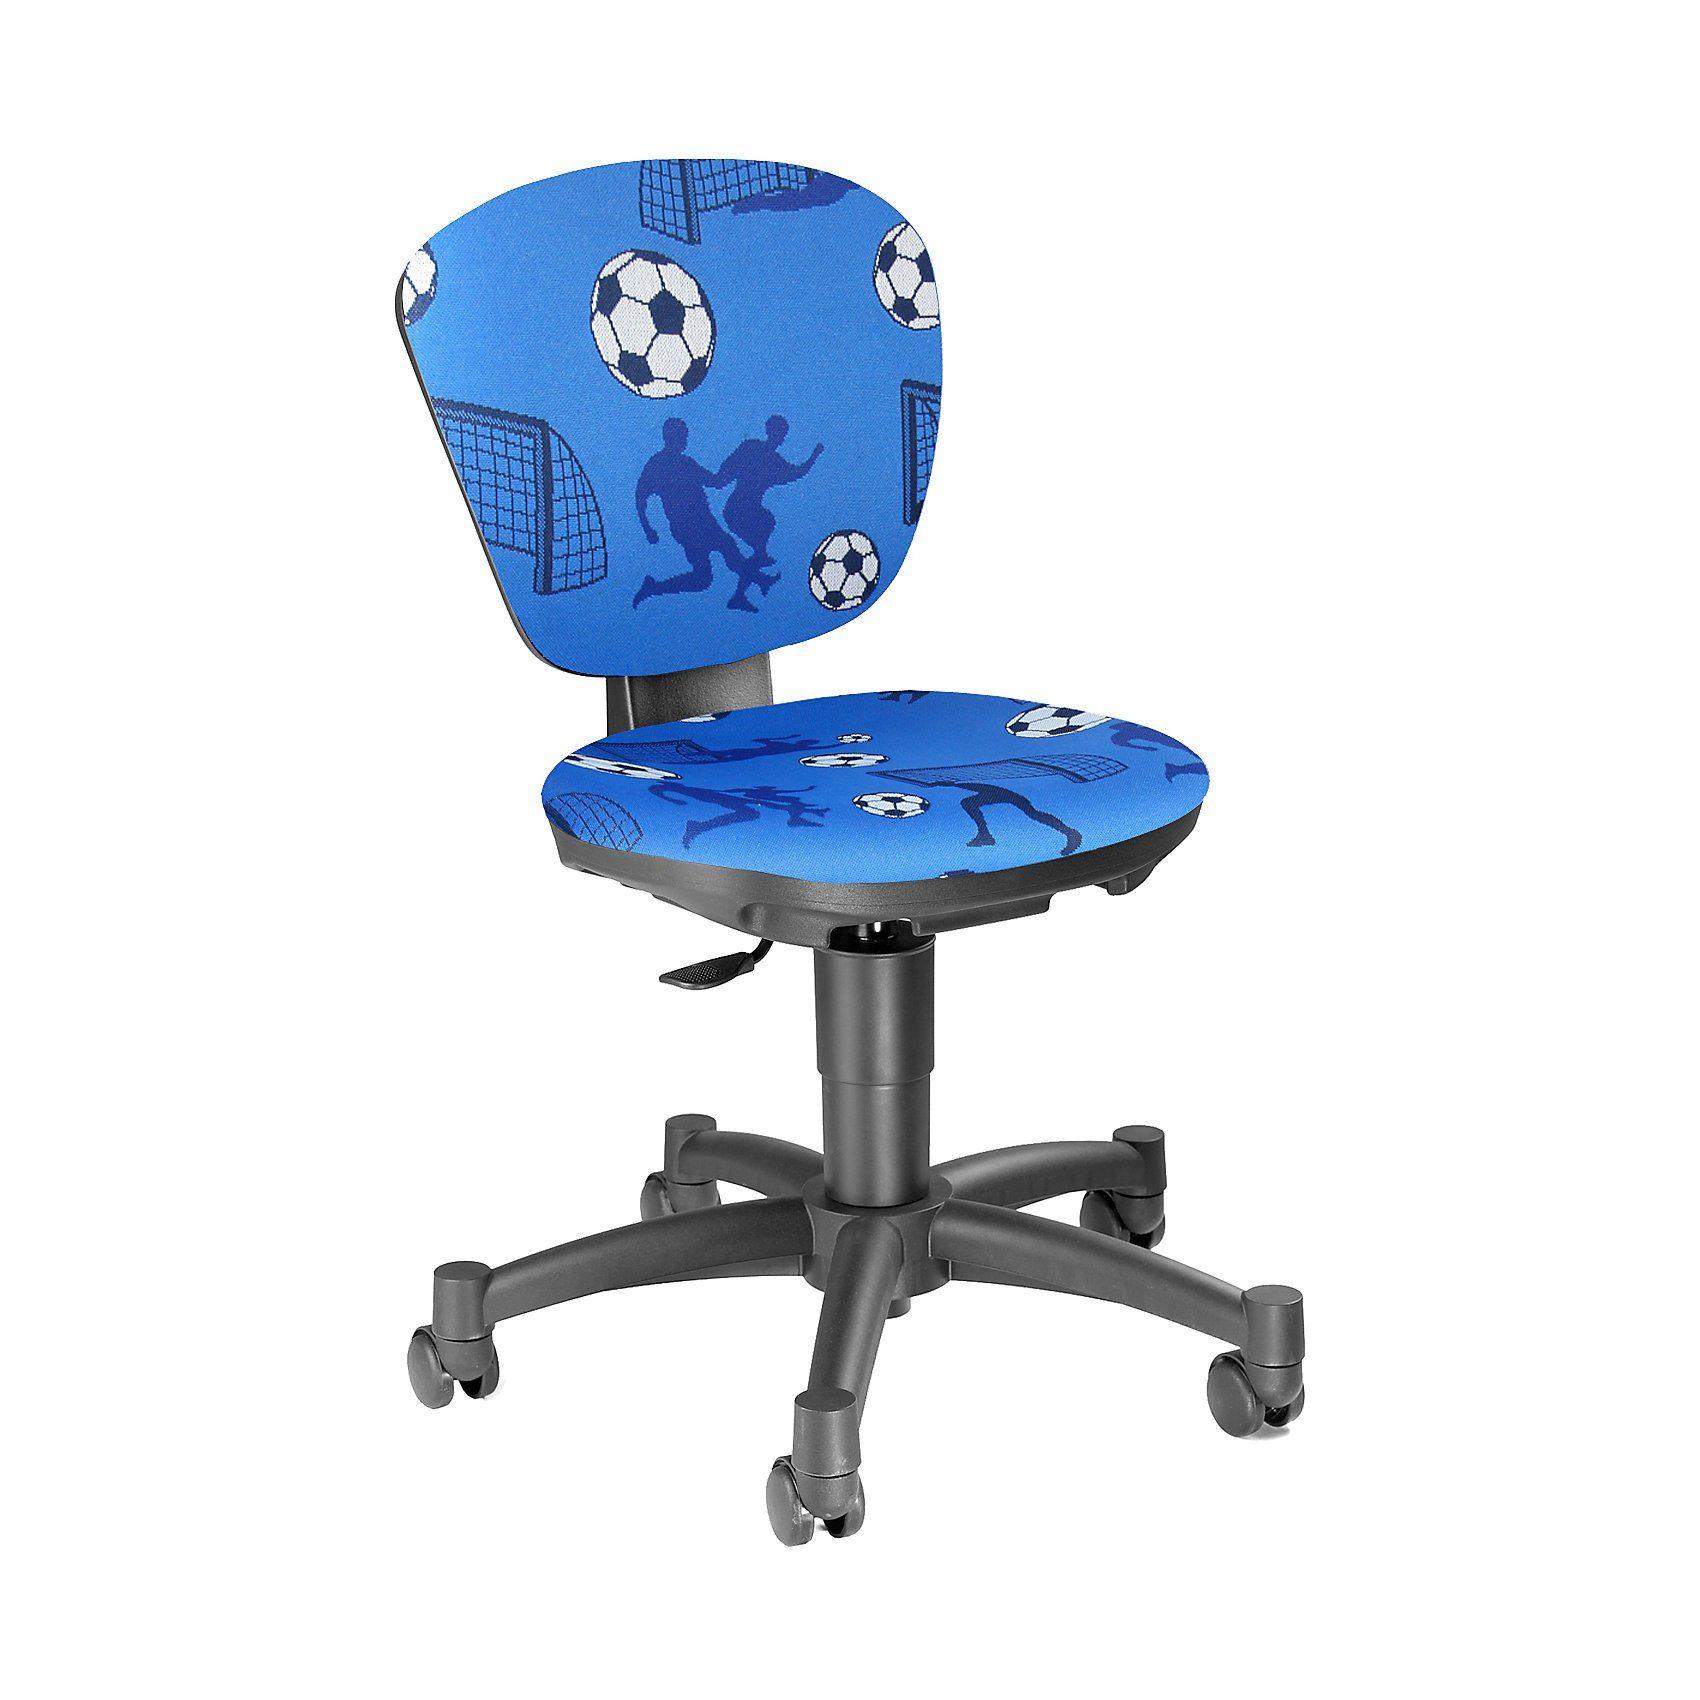 Topstar Drehstuhl Ergokid 15 Jet Soccer blau